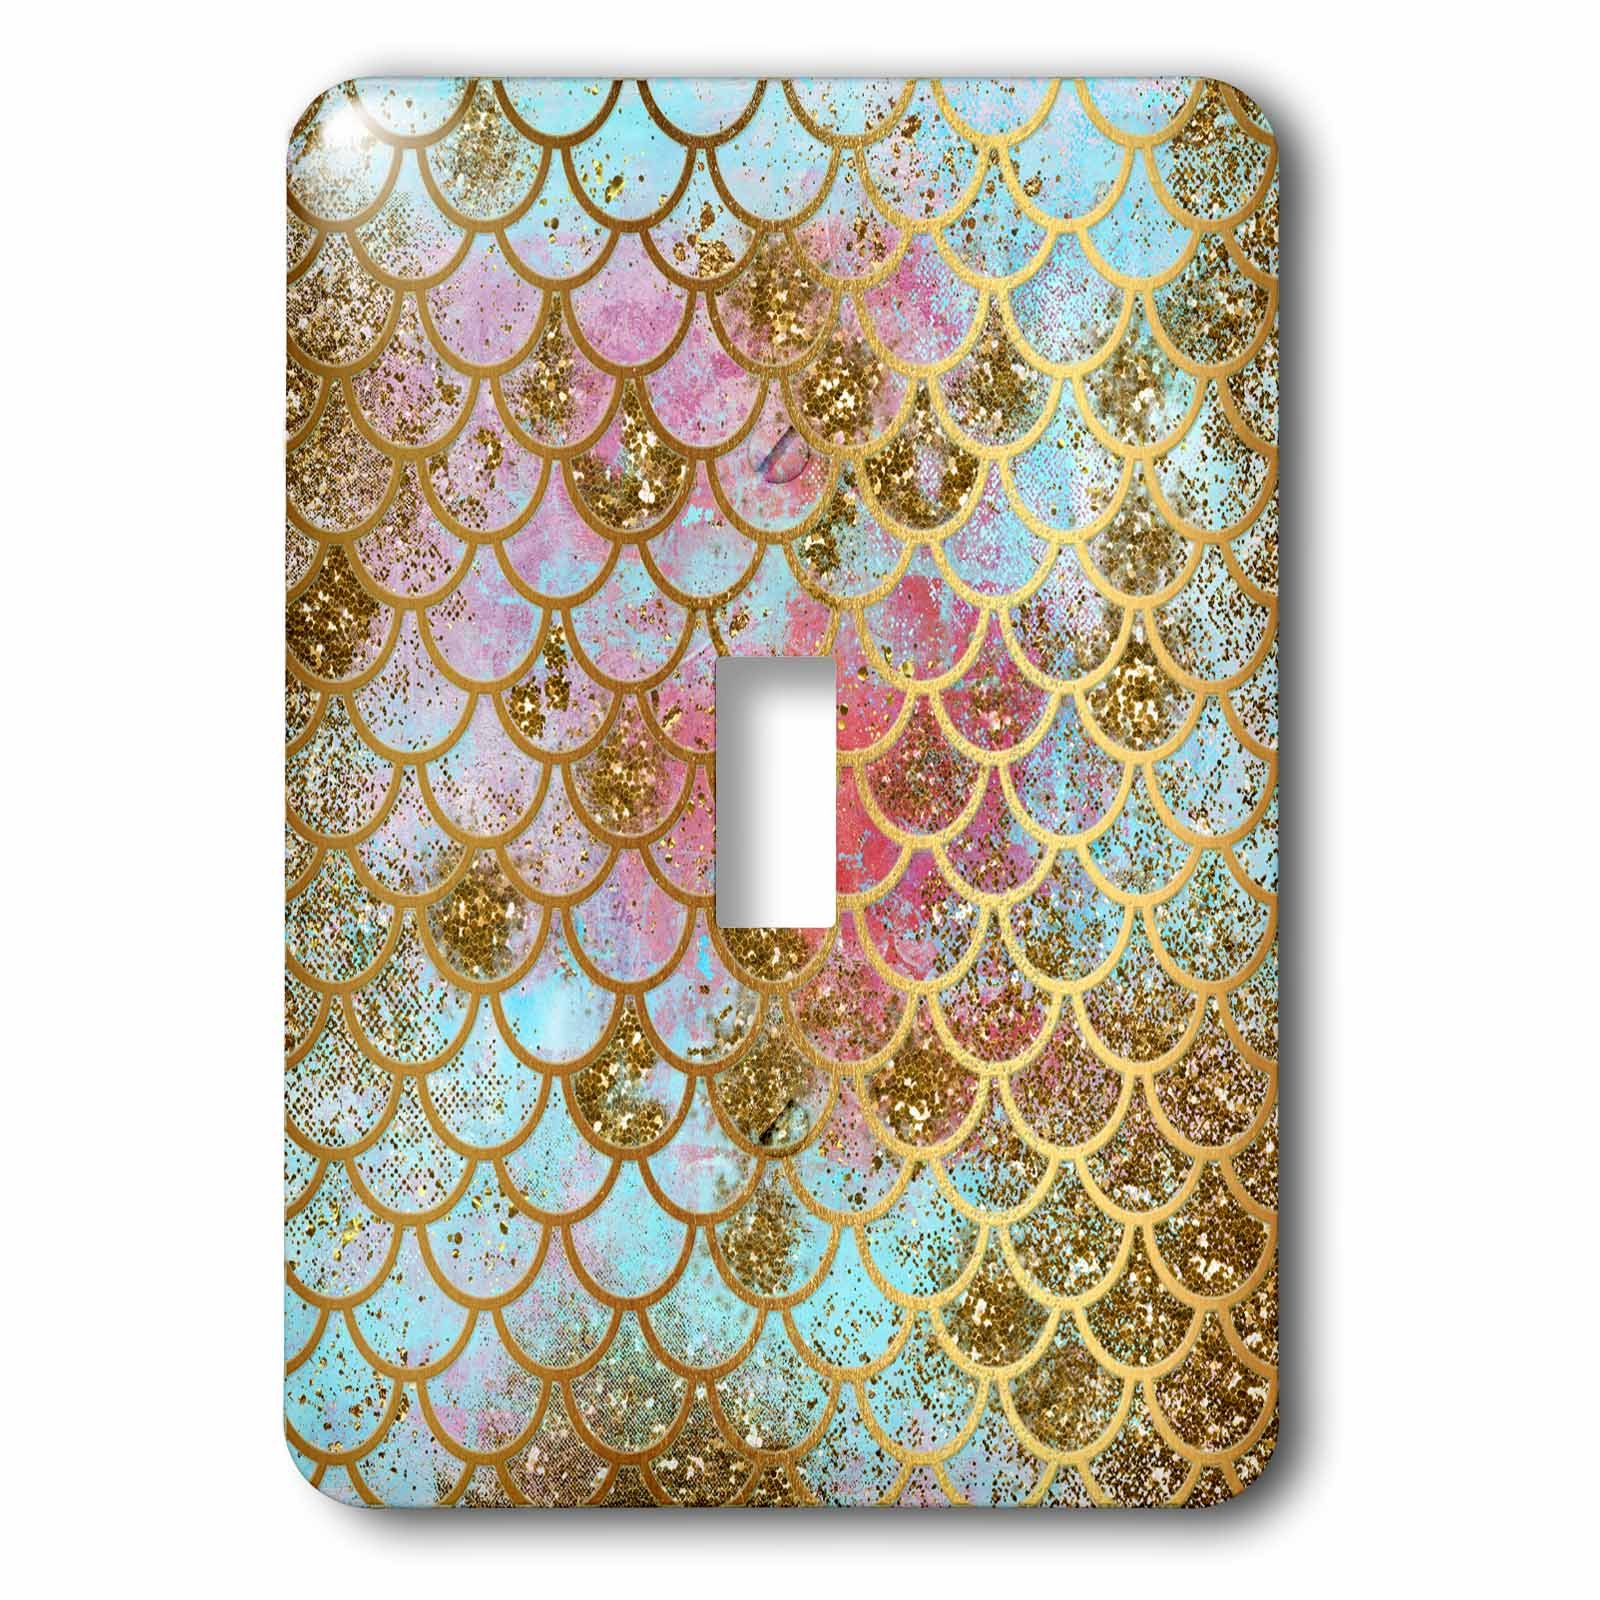 3dRose (LSP_266933_1 Single Toggle Switch Sparkling Pink Luxury Elegant Mermaid Scales Glitter Effect Art Print